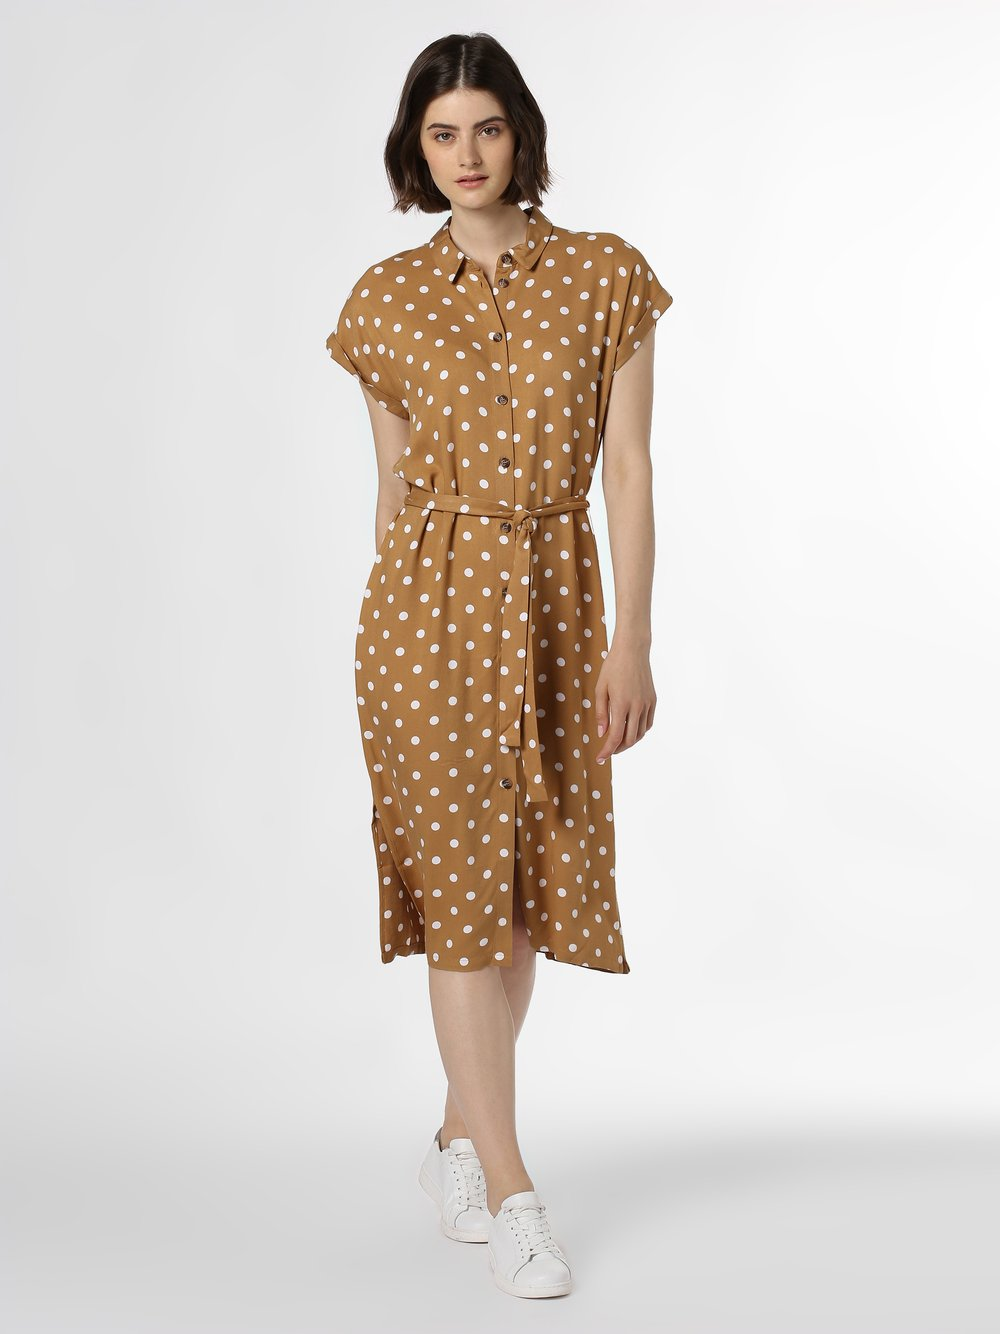 Minimum – Sukienka damska – Idot, brązowy Van Graaf 438069-0001-00360